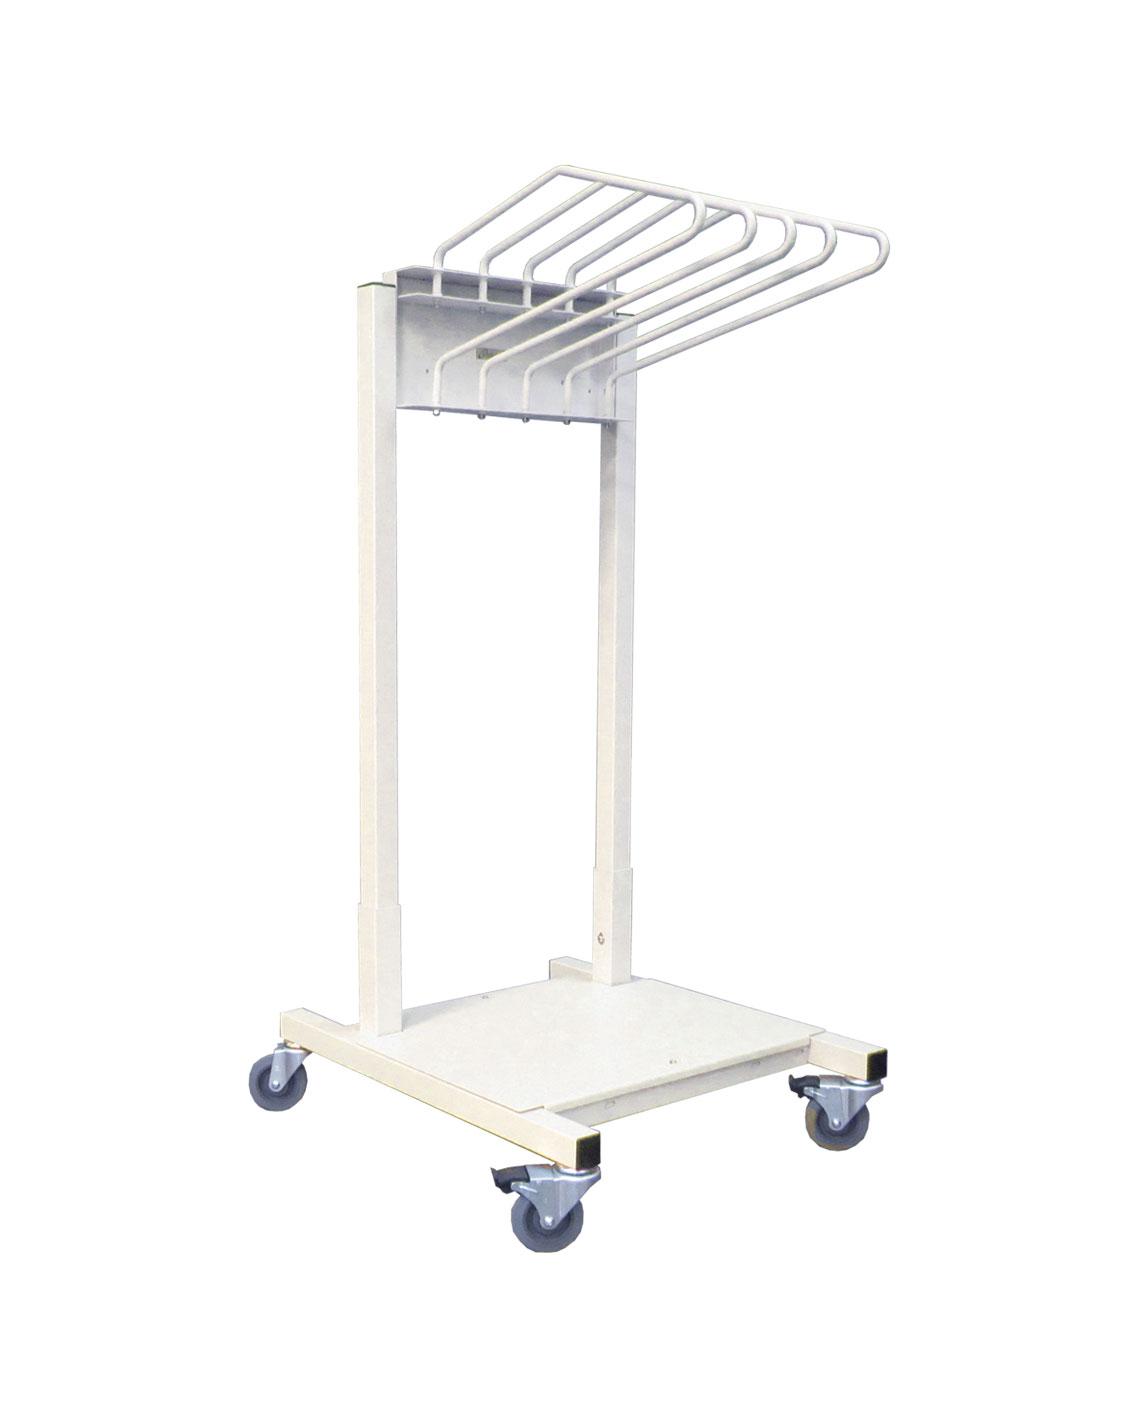 lead apron rack mobile budget saver 5 arm